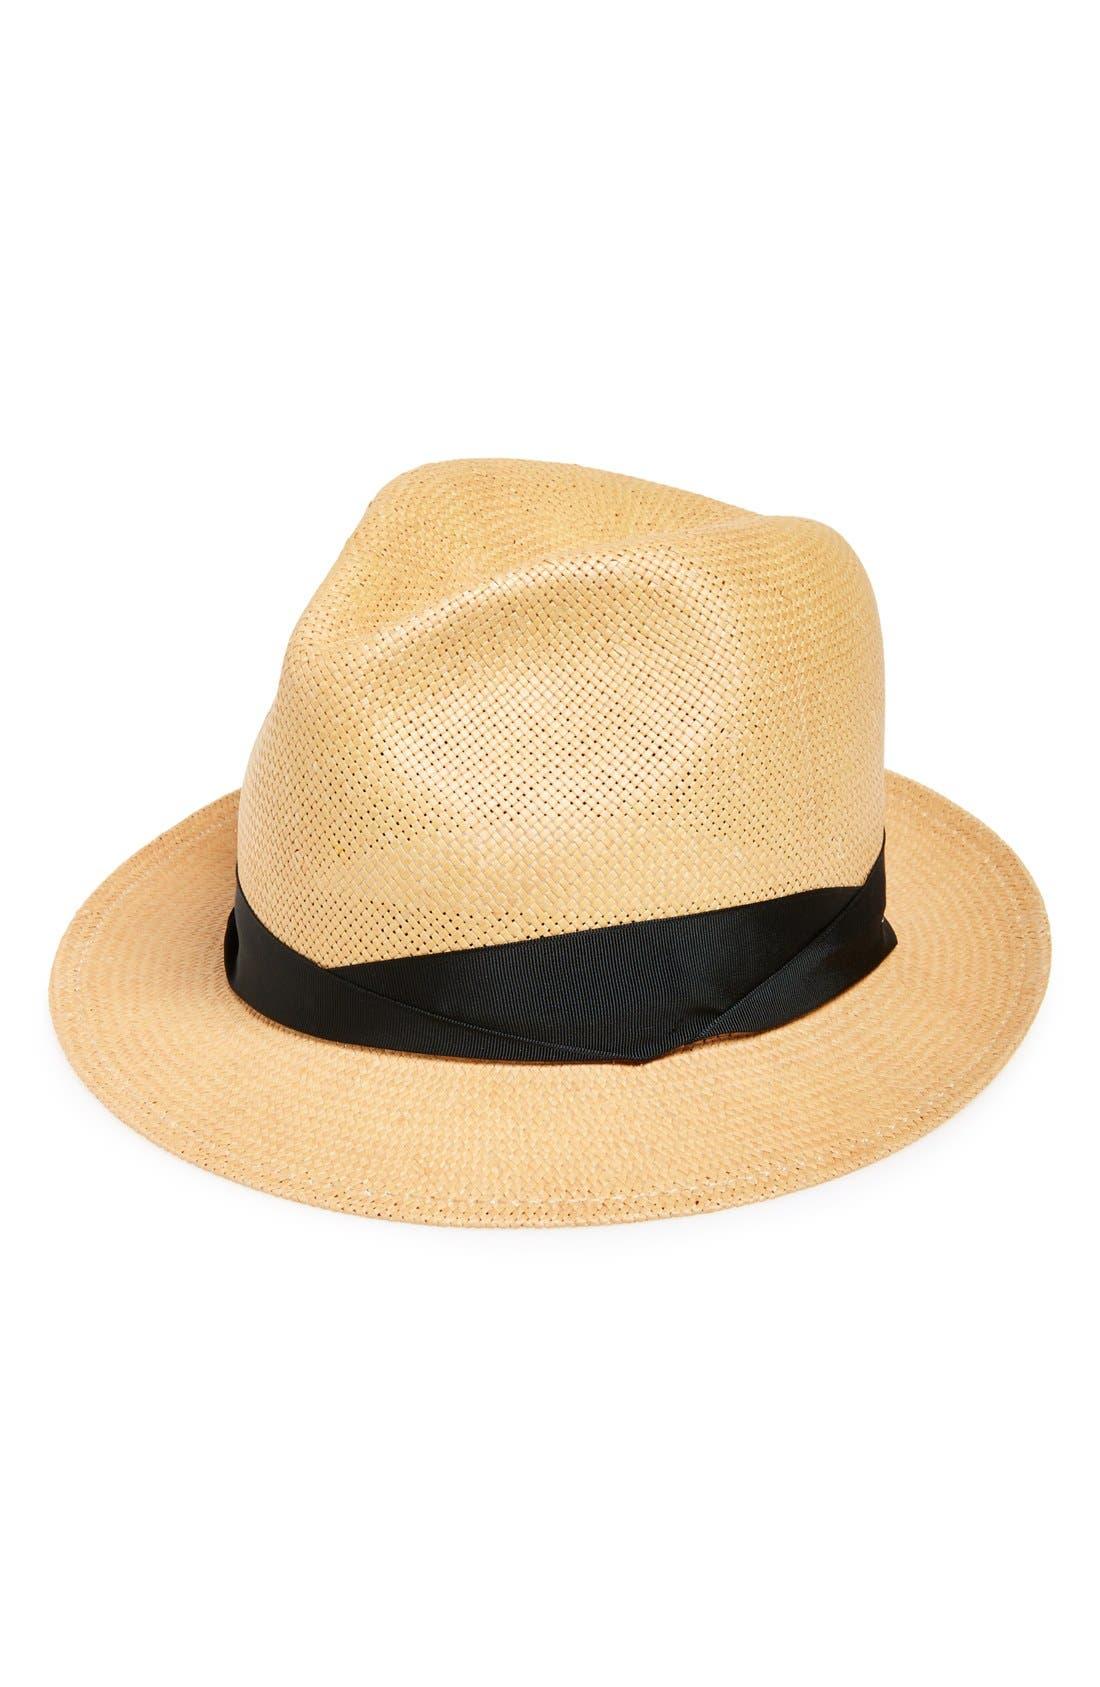 Alternate Image 1 Selected - rag & bone 'Summer' Straw Fedora